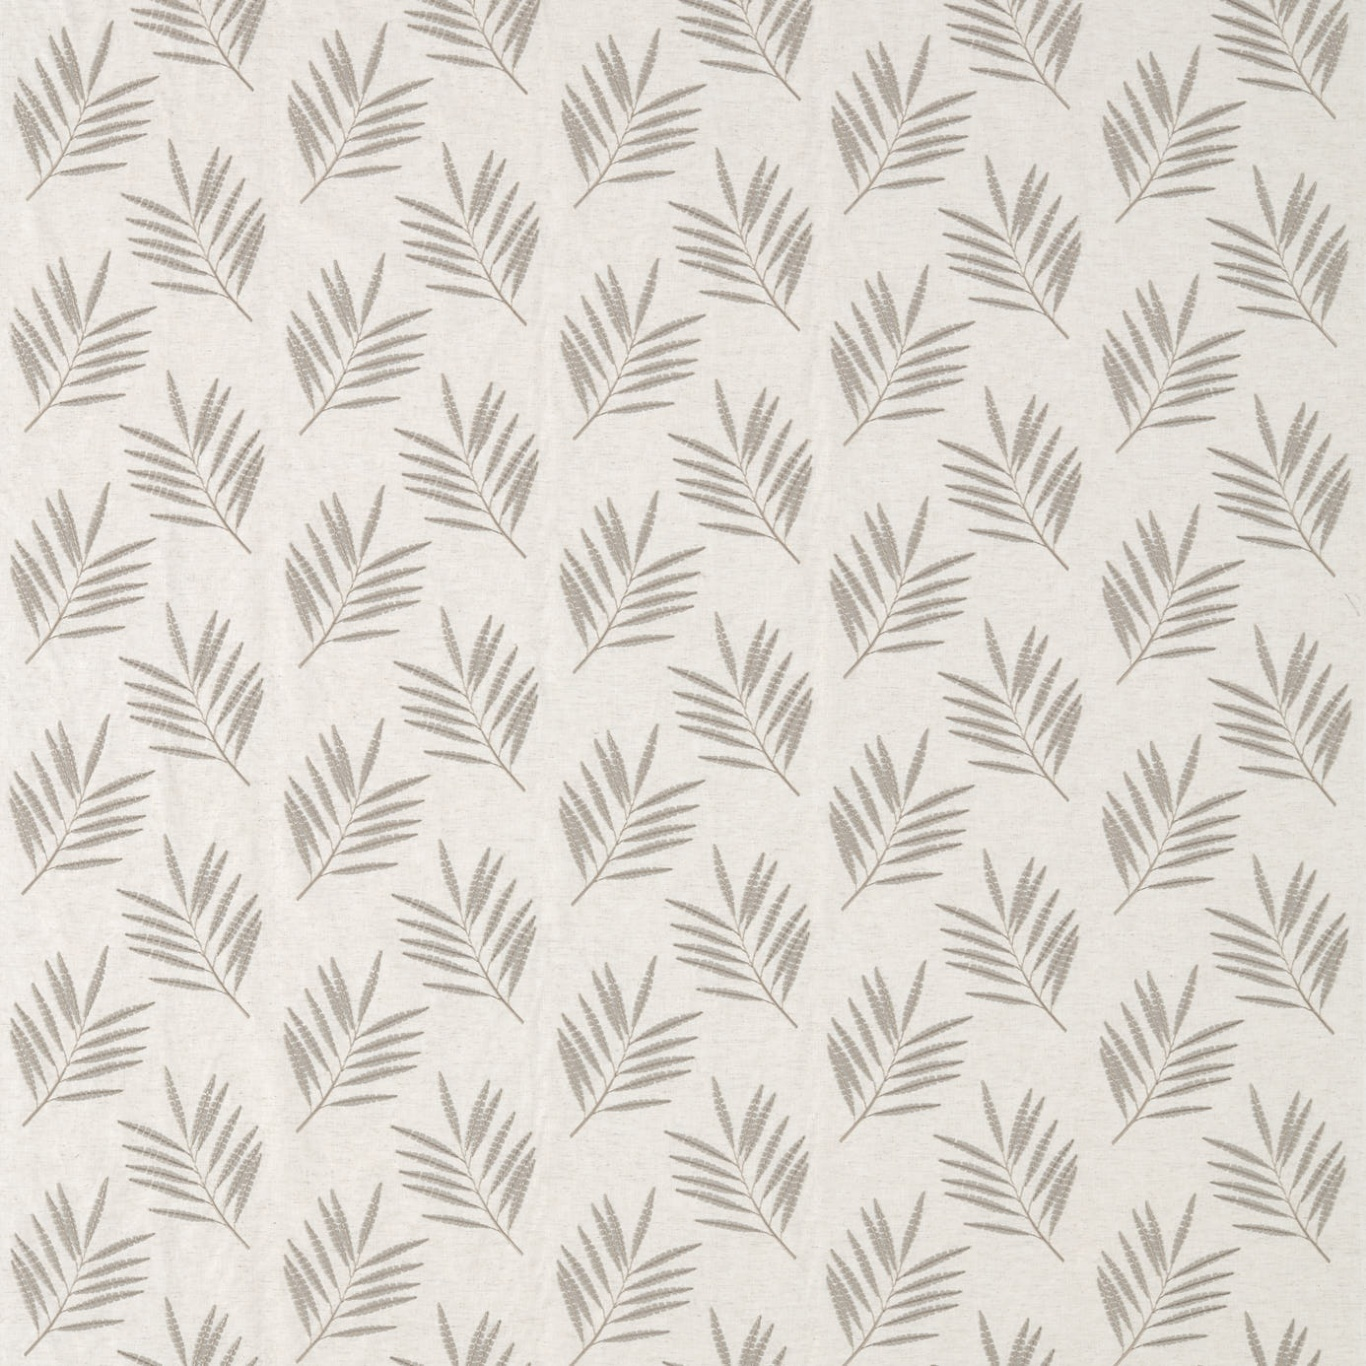 Image of Sanderson Tilton Stone Fabric 236286